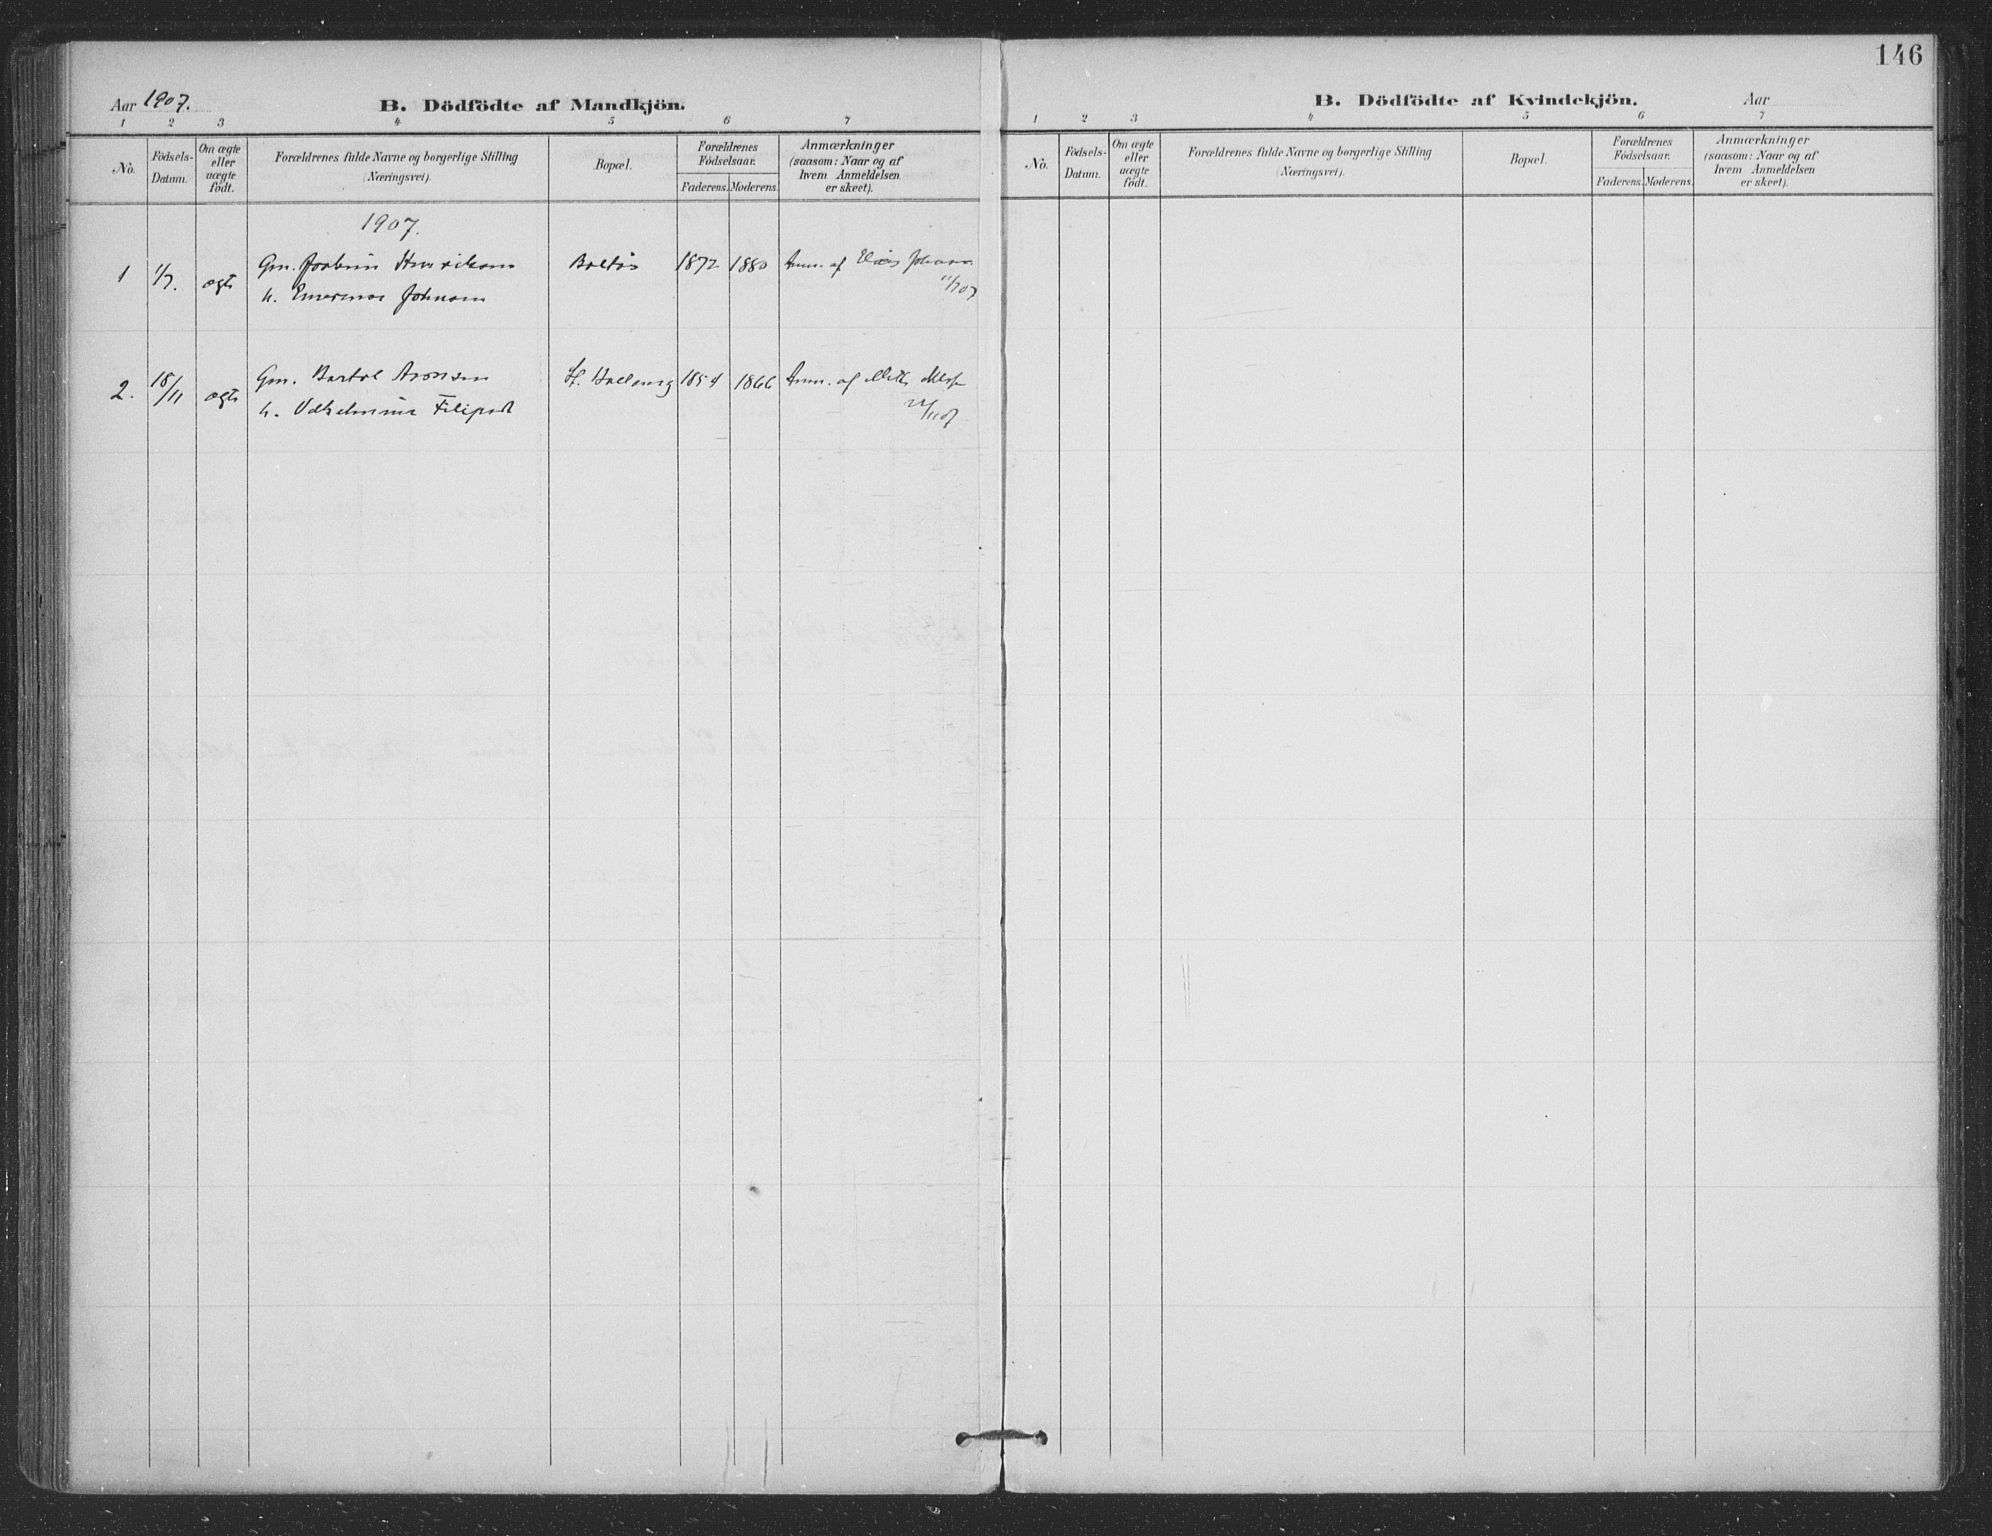 SAT, Ministerialprotokoller, klokkerbøker og fødselsregistre - Nordland, 863/L0899: Ministerialbok nr. 863A11, 1897-1906, s. 146